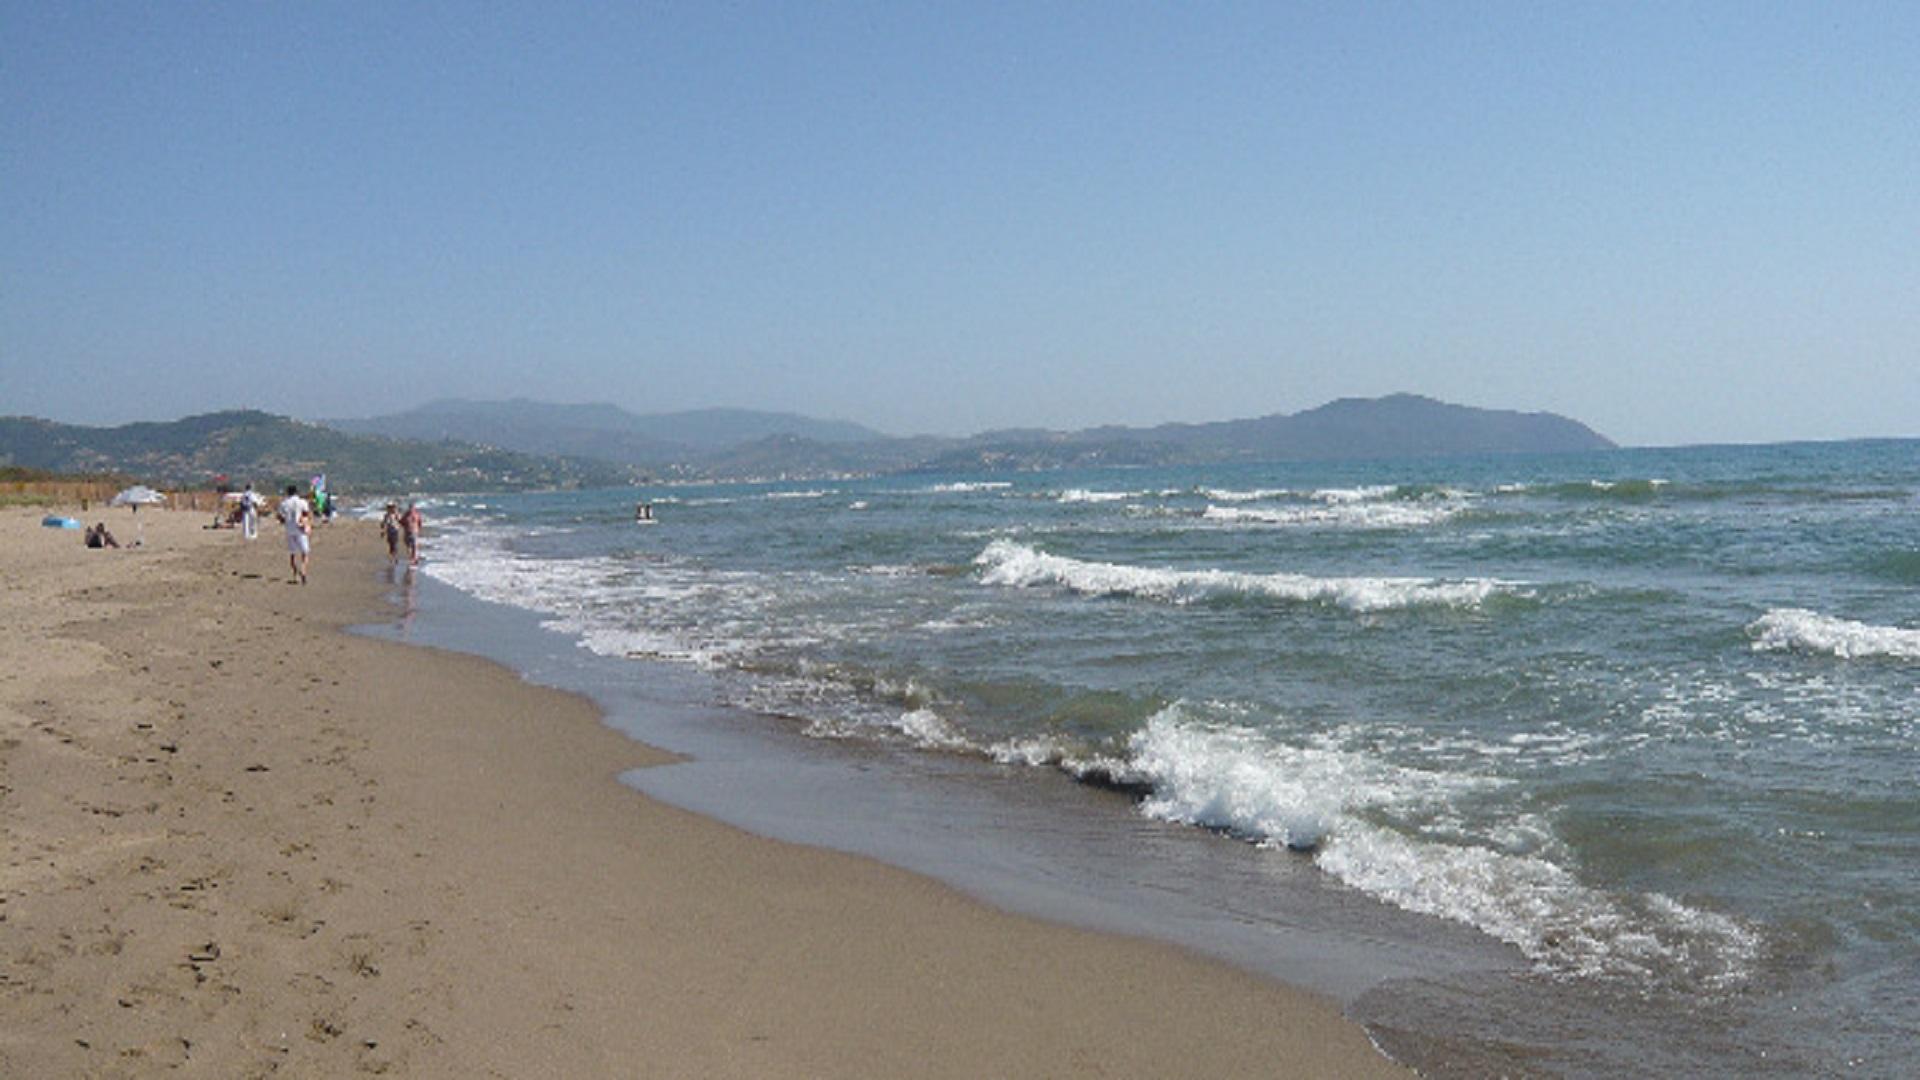 Matrimonio Spiaggia Paestum : Paestum turisti stranieri derubati in spiaggia a licinella